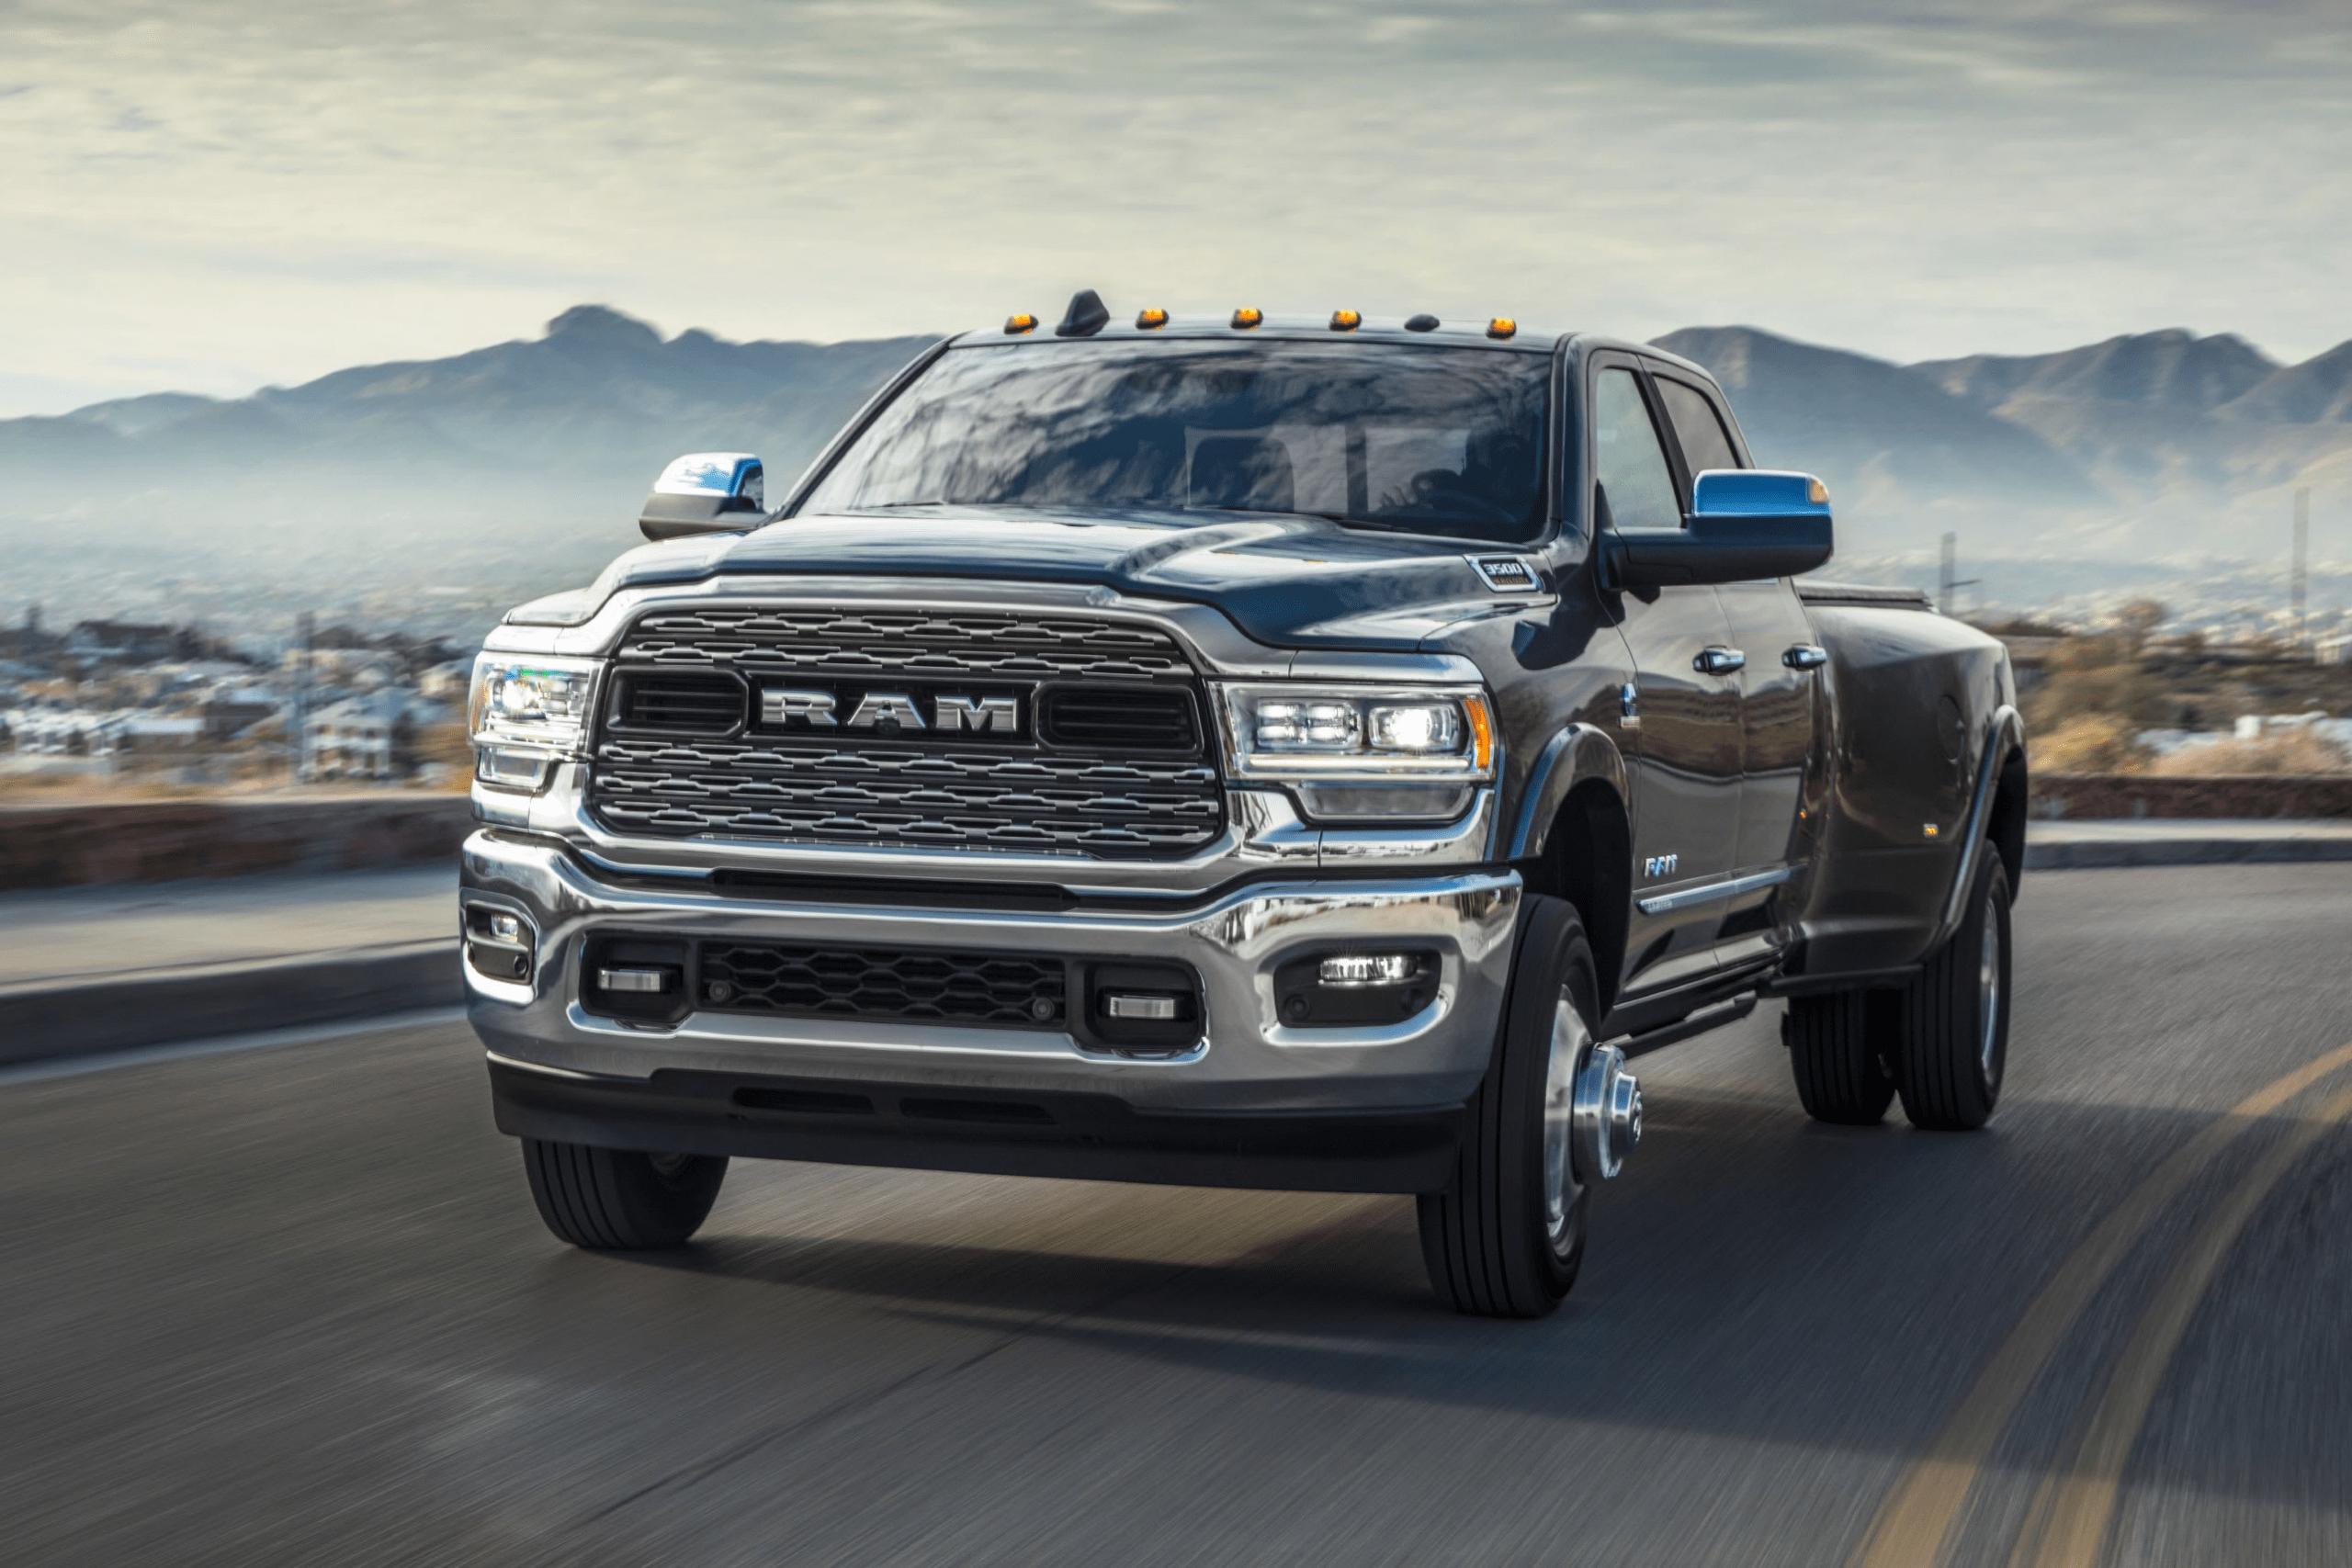 2020 Dodge Ram Truck Exterior And Interior In 2020 Pickup Trucks Heavy Duty Trucks Ram Trucks